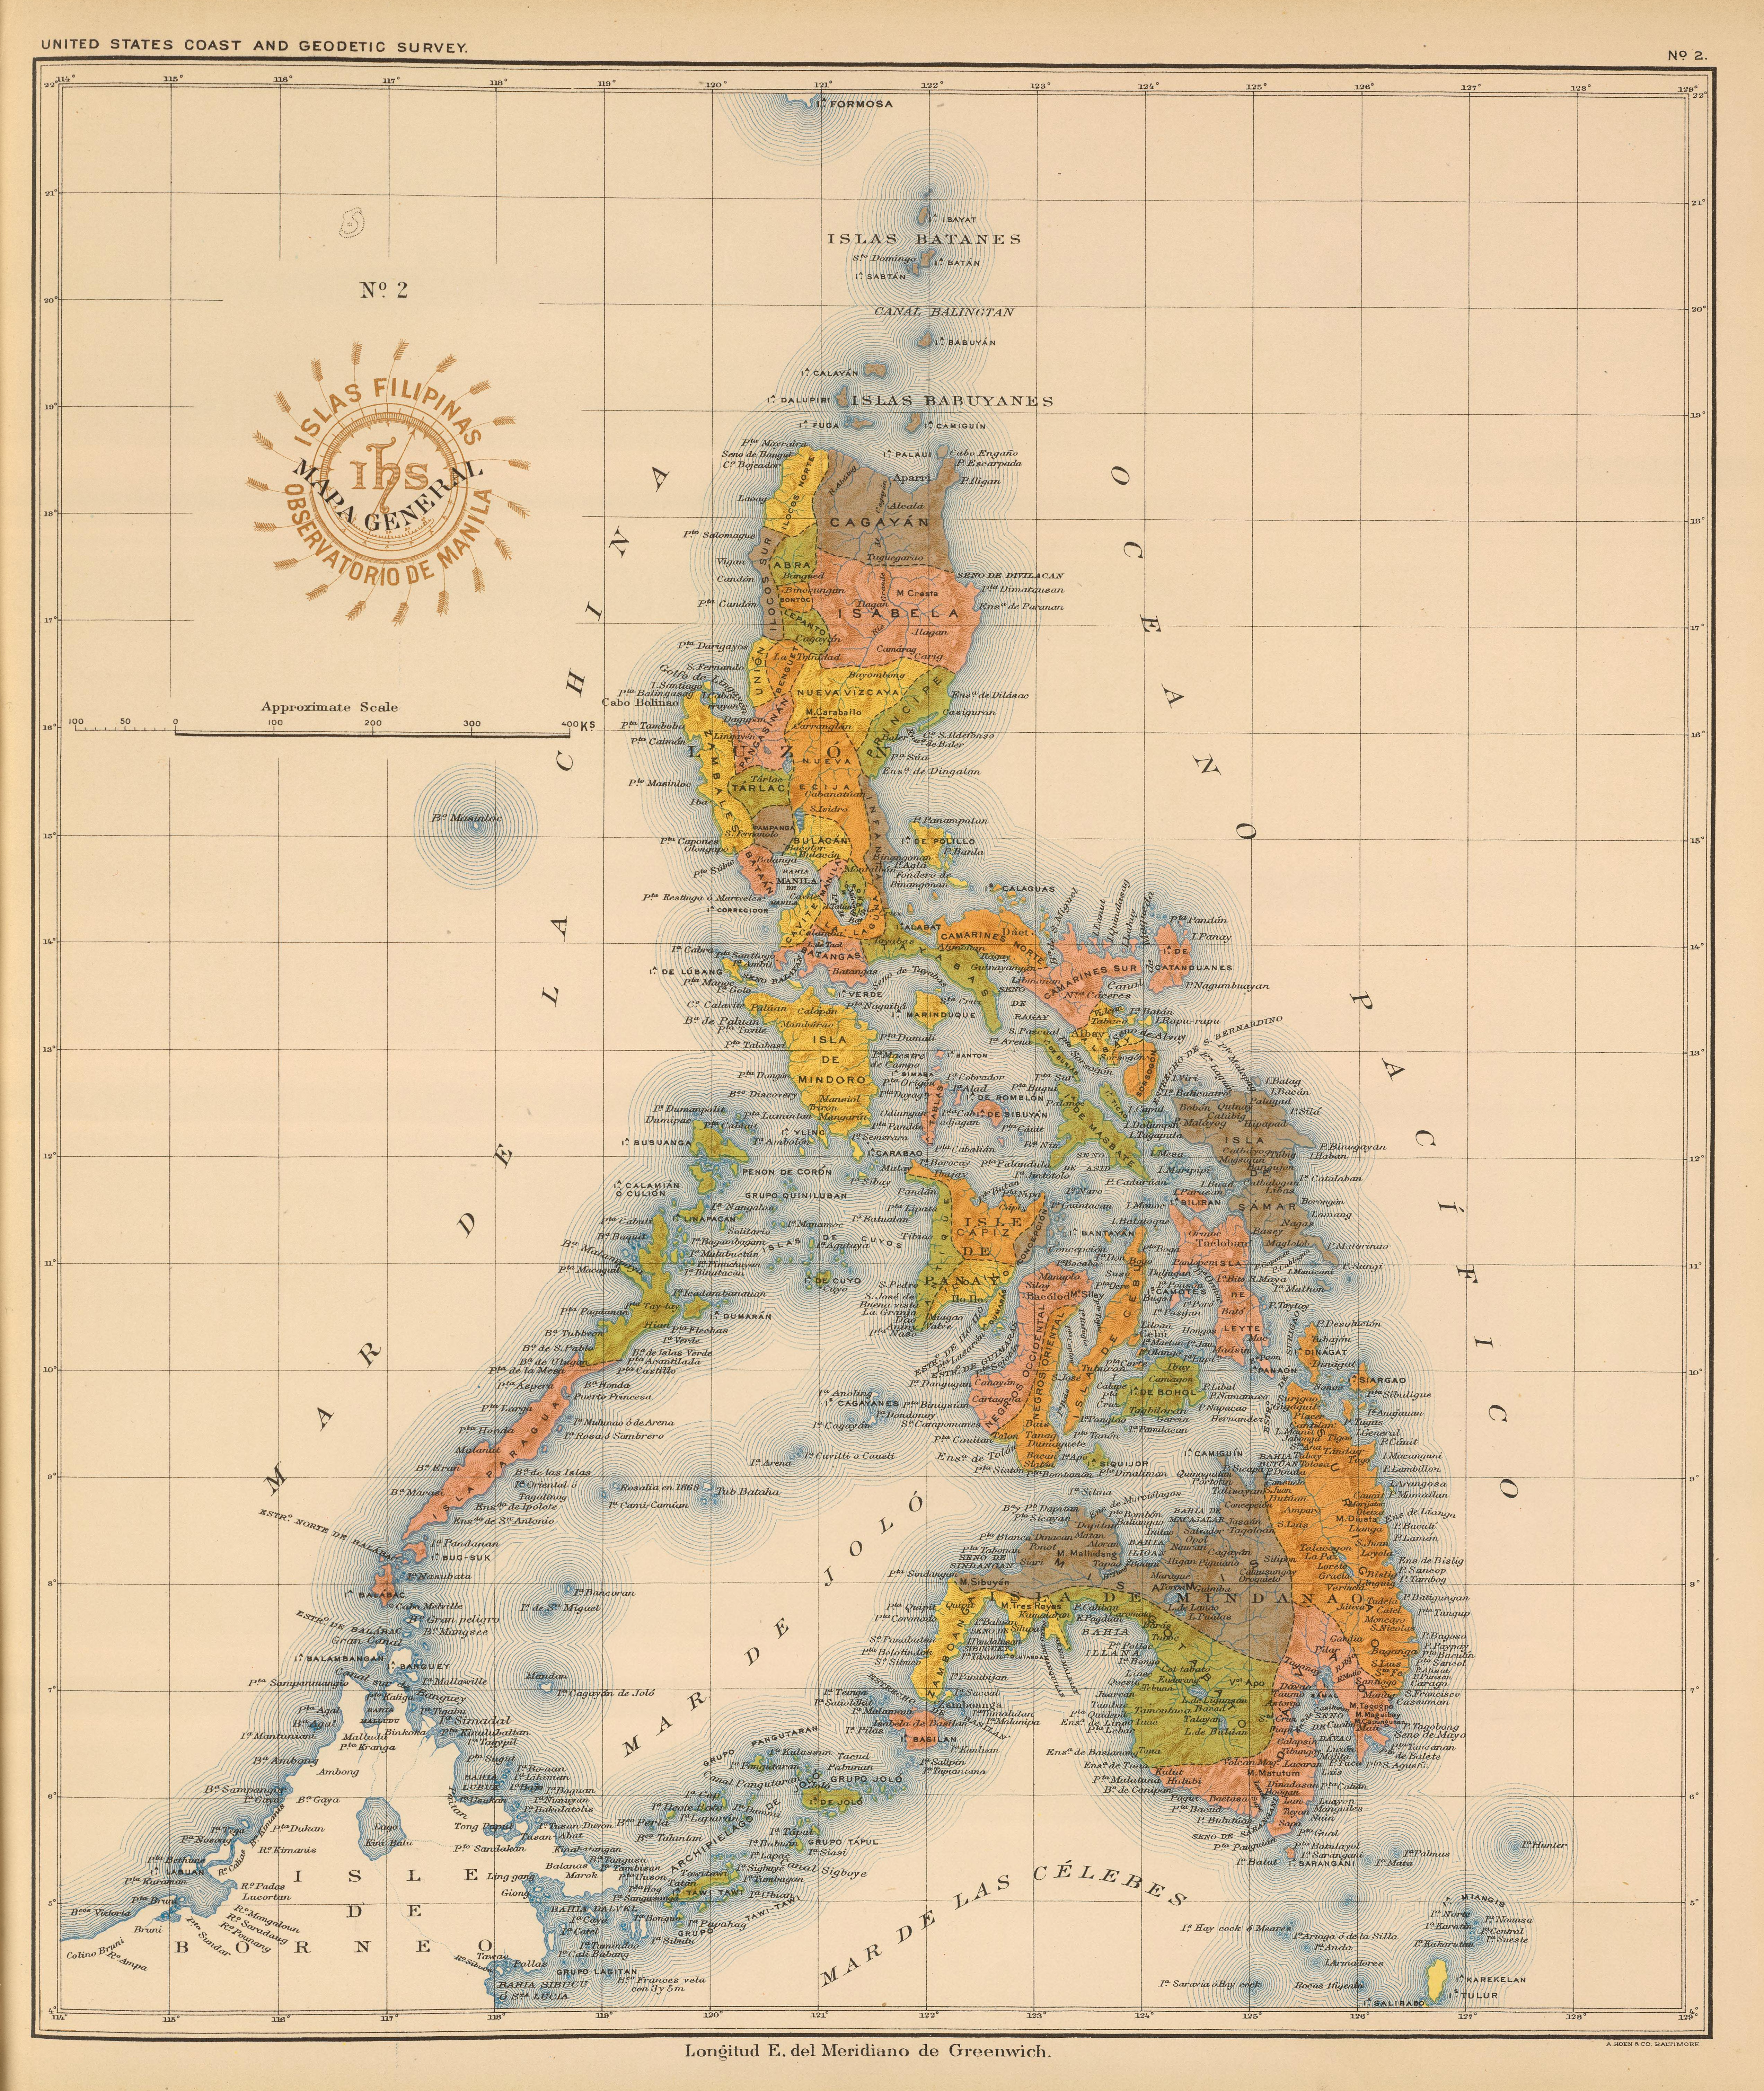 Philippine_Islands_-_1899_political_map.jpg